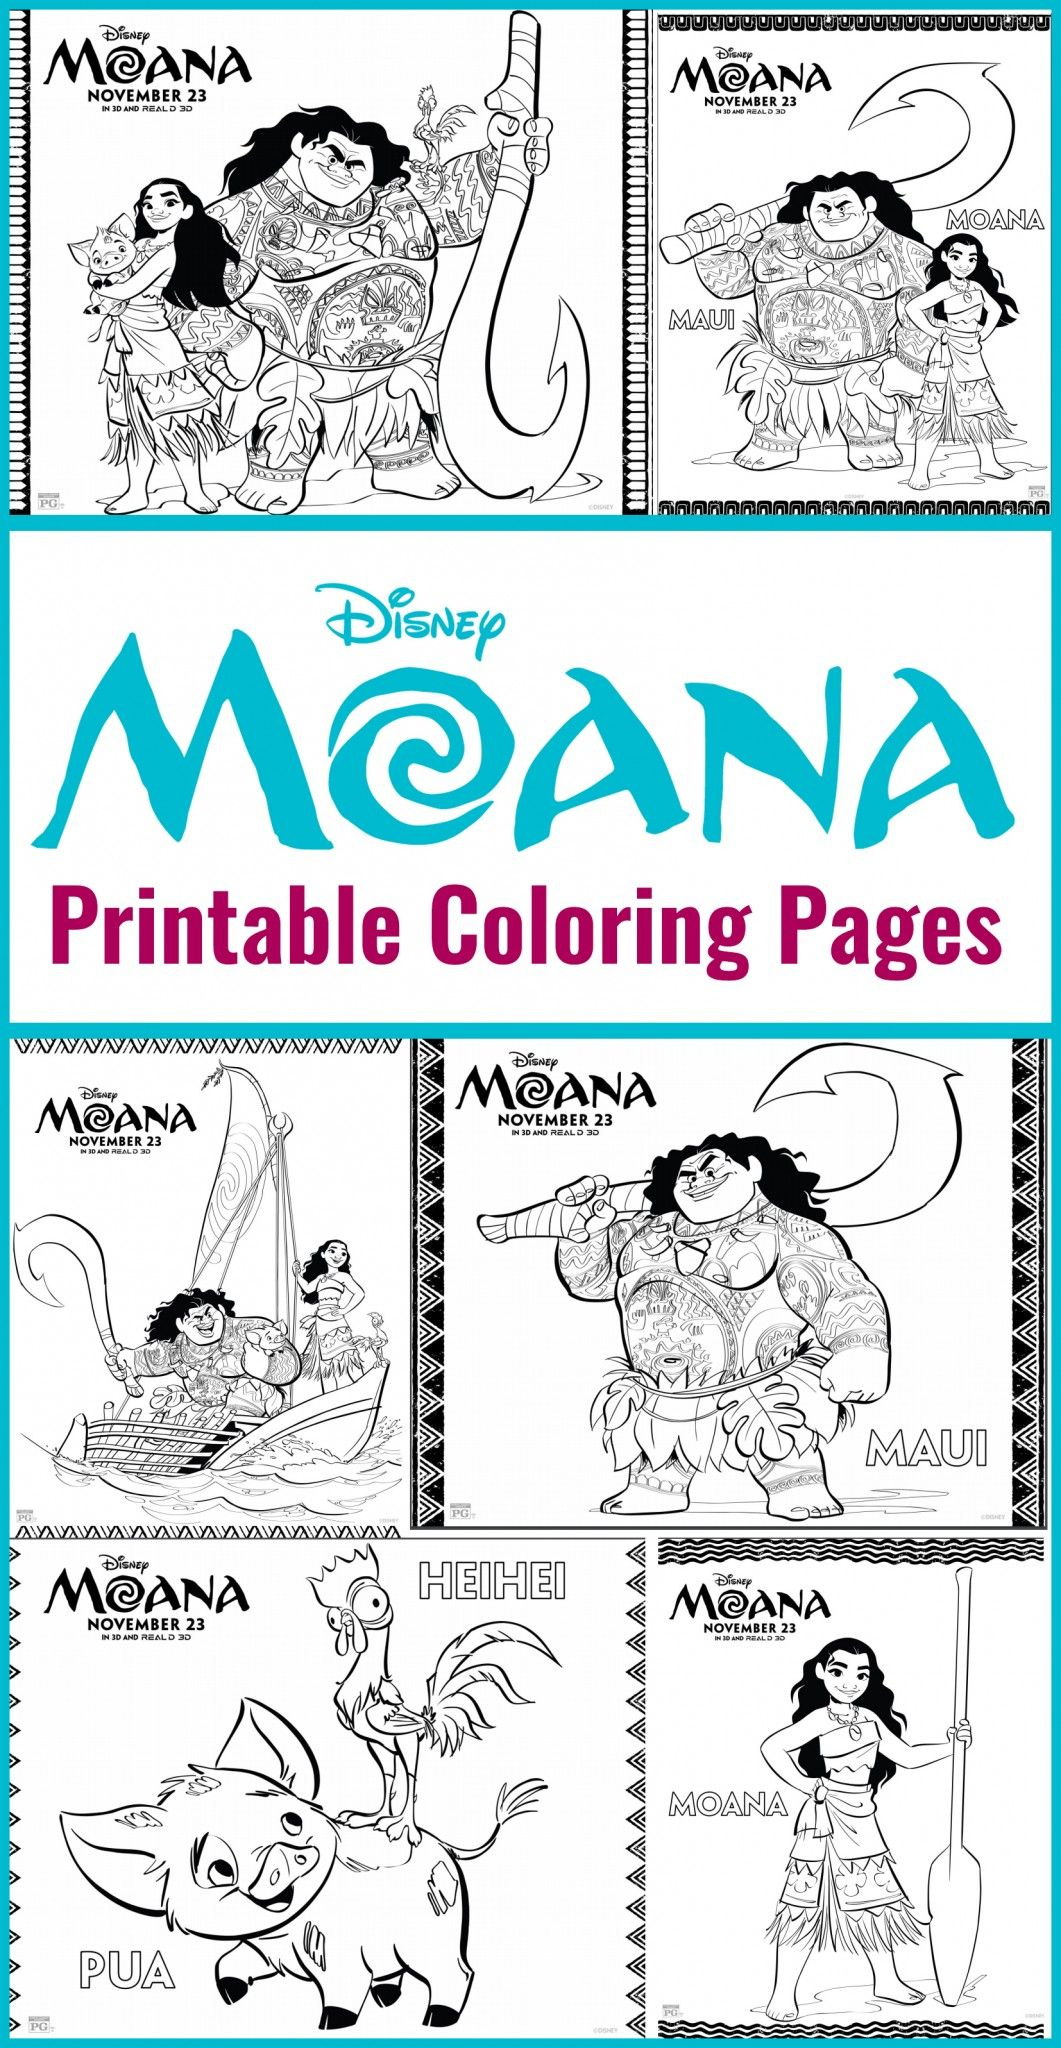 Printables Disney 39 s Moana Coloring